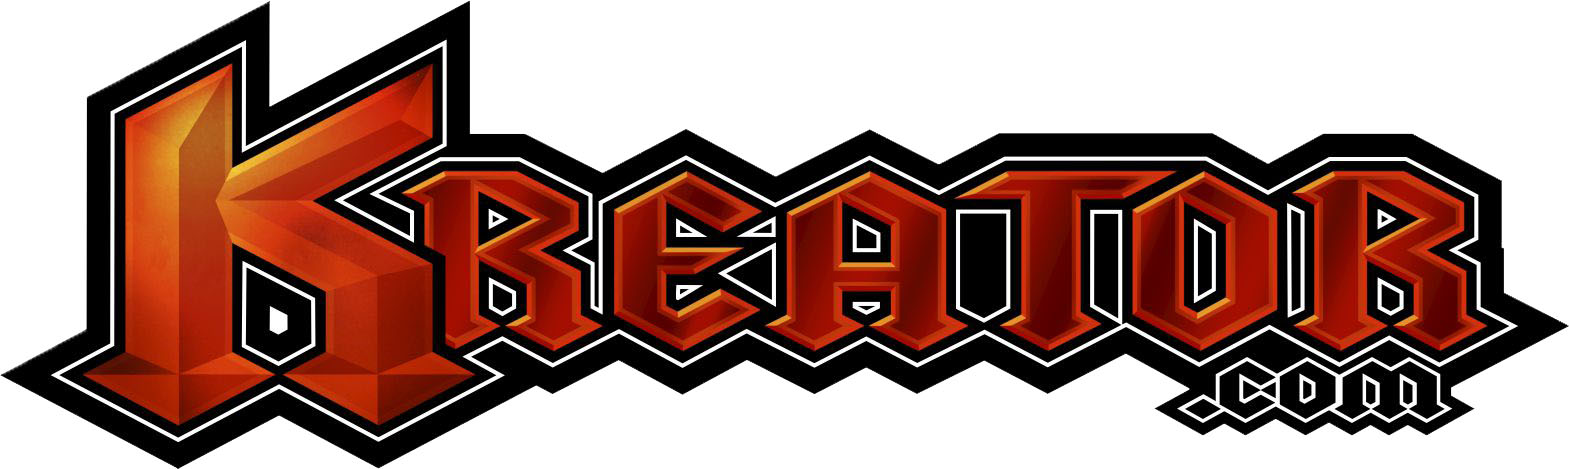 kreator-logo